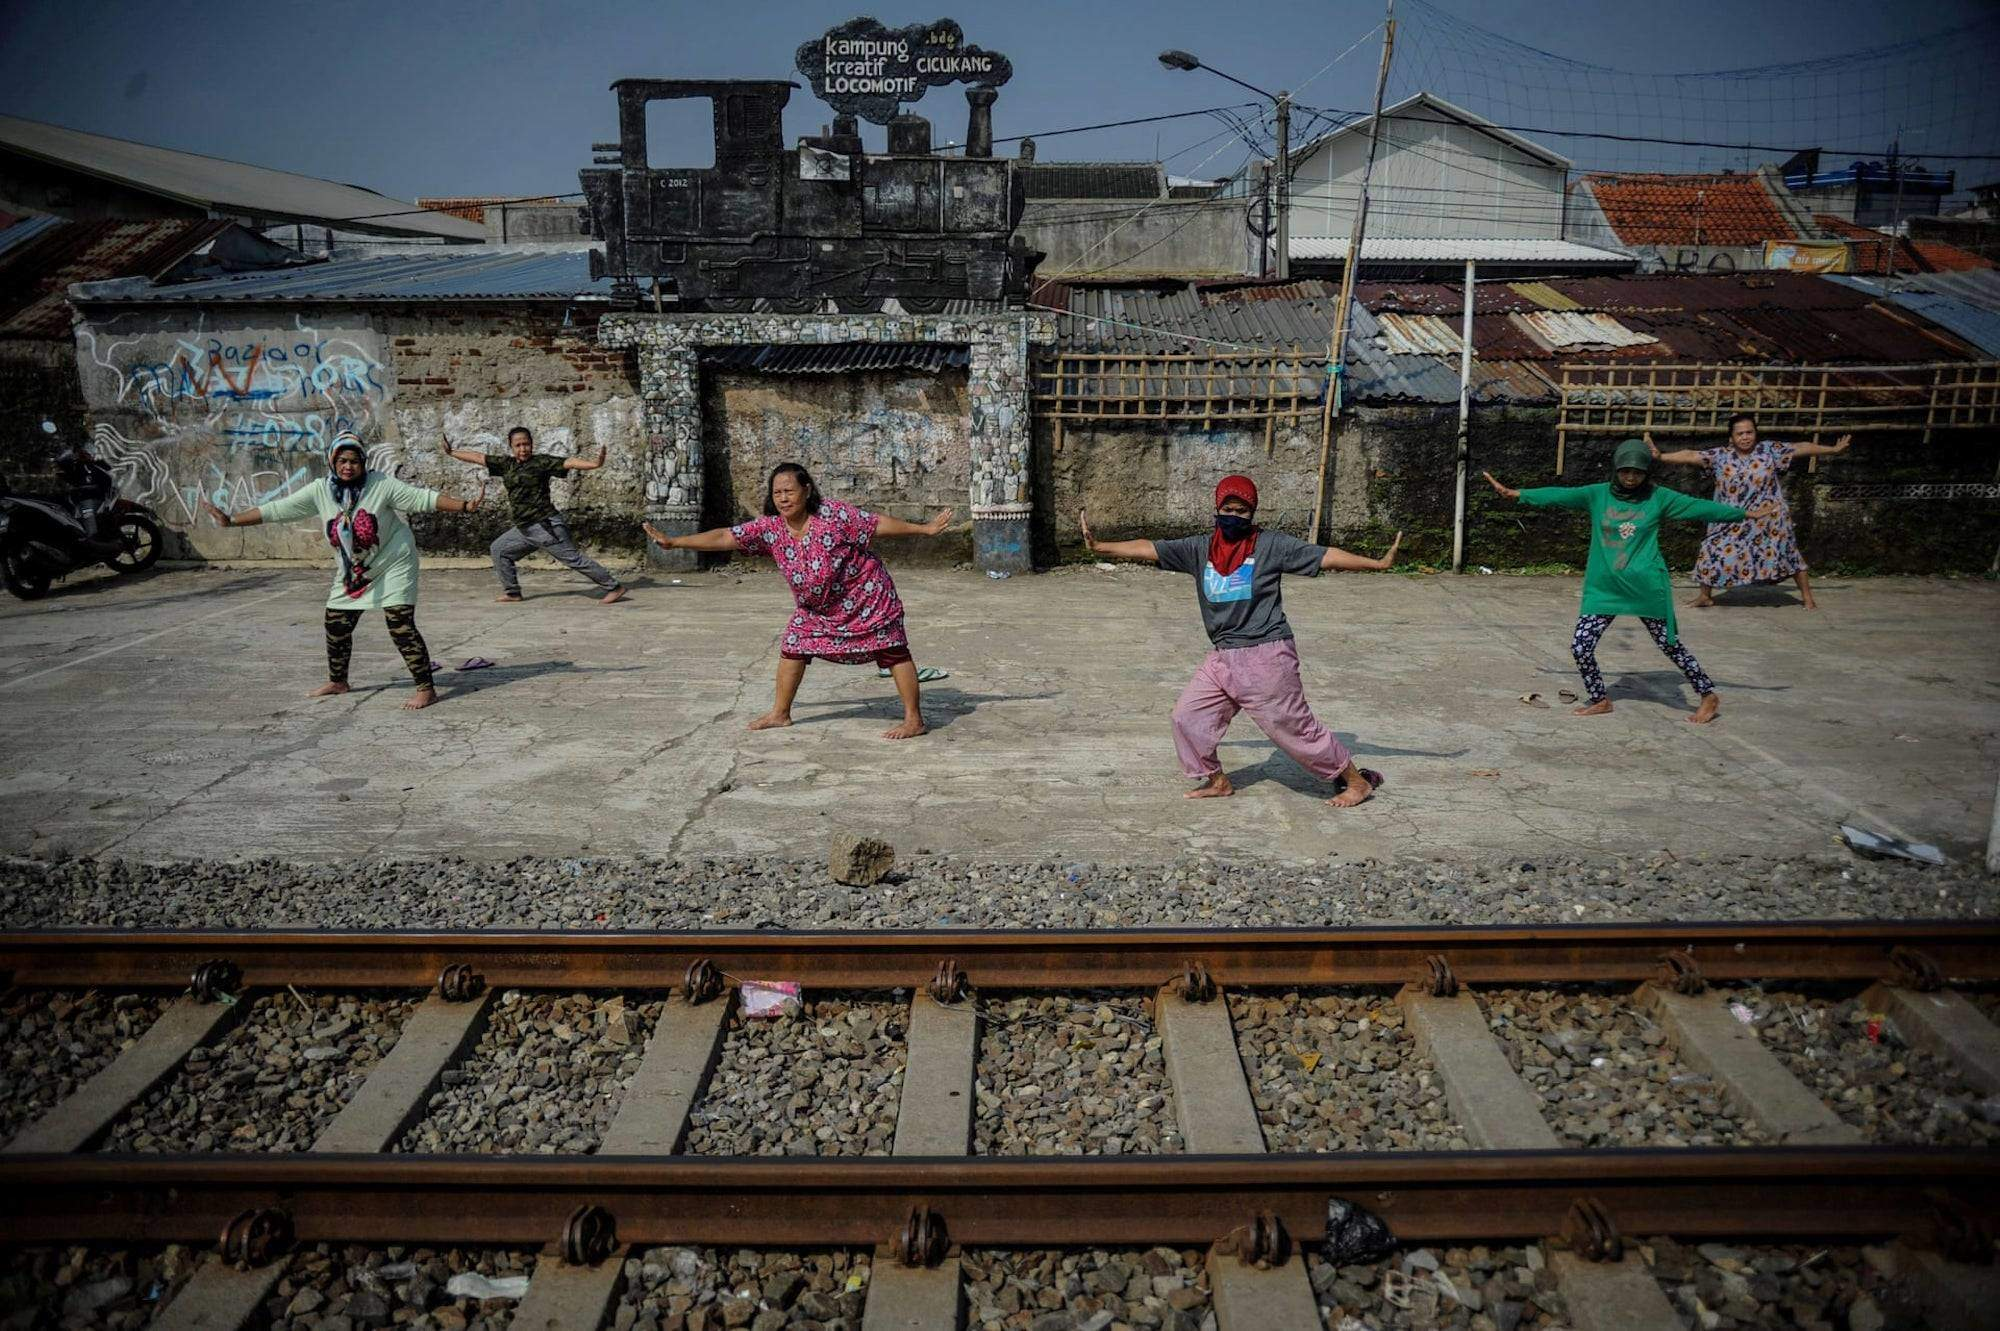 Fotografia_Raisan Al Faris__The Guardian 20 Aprile_1